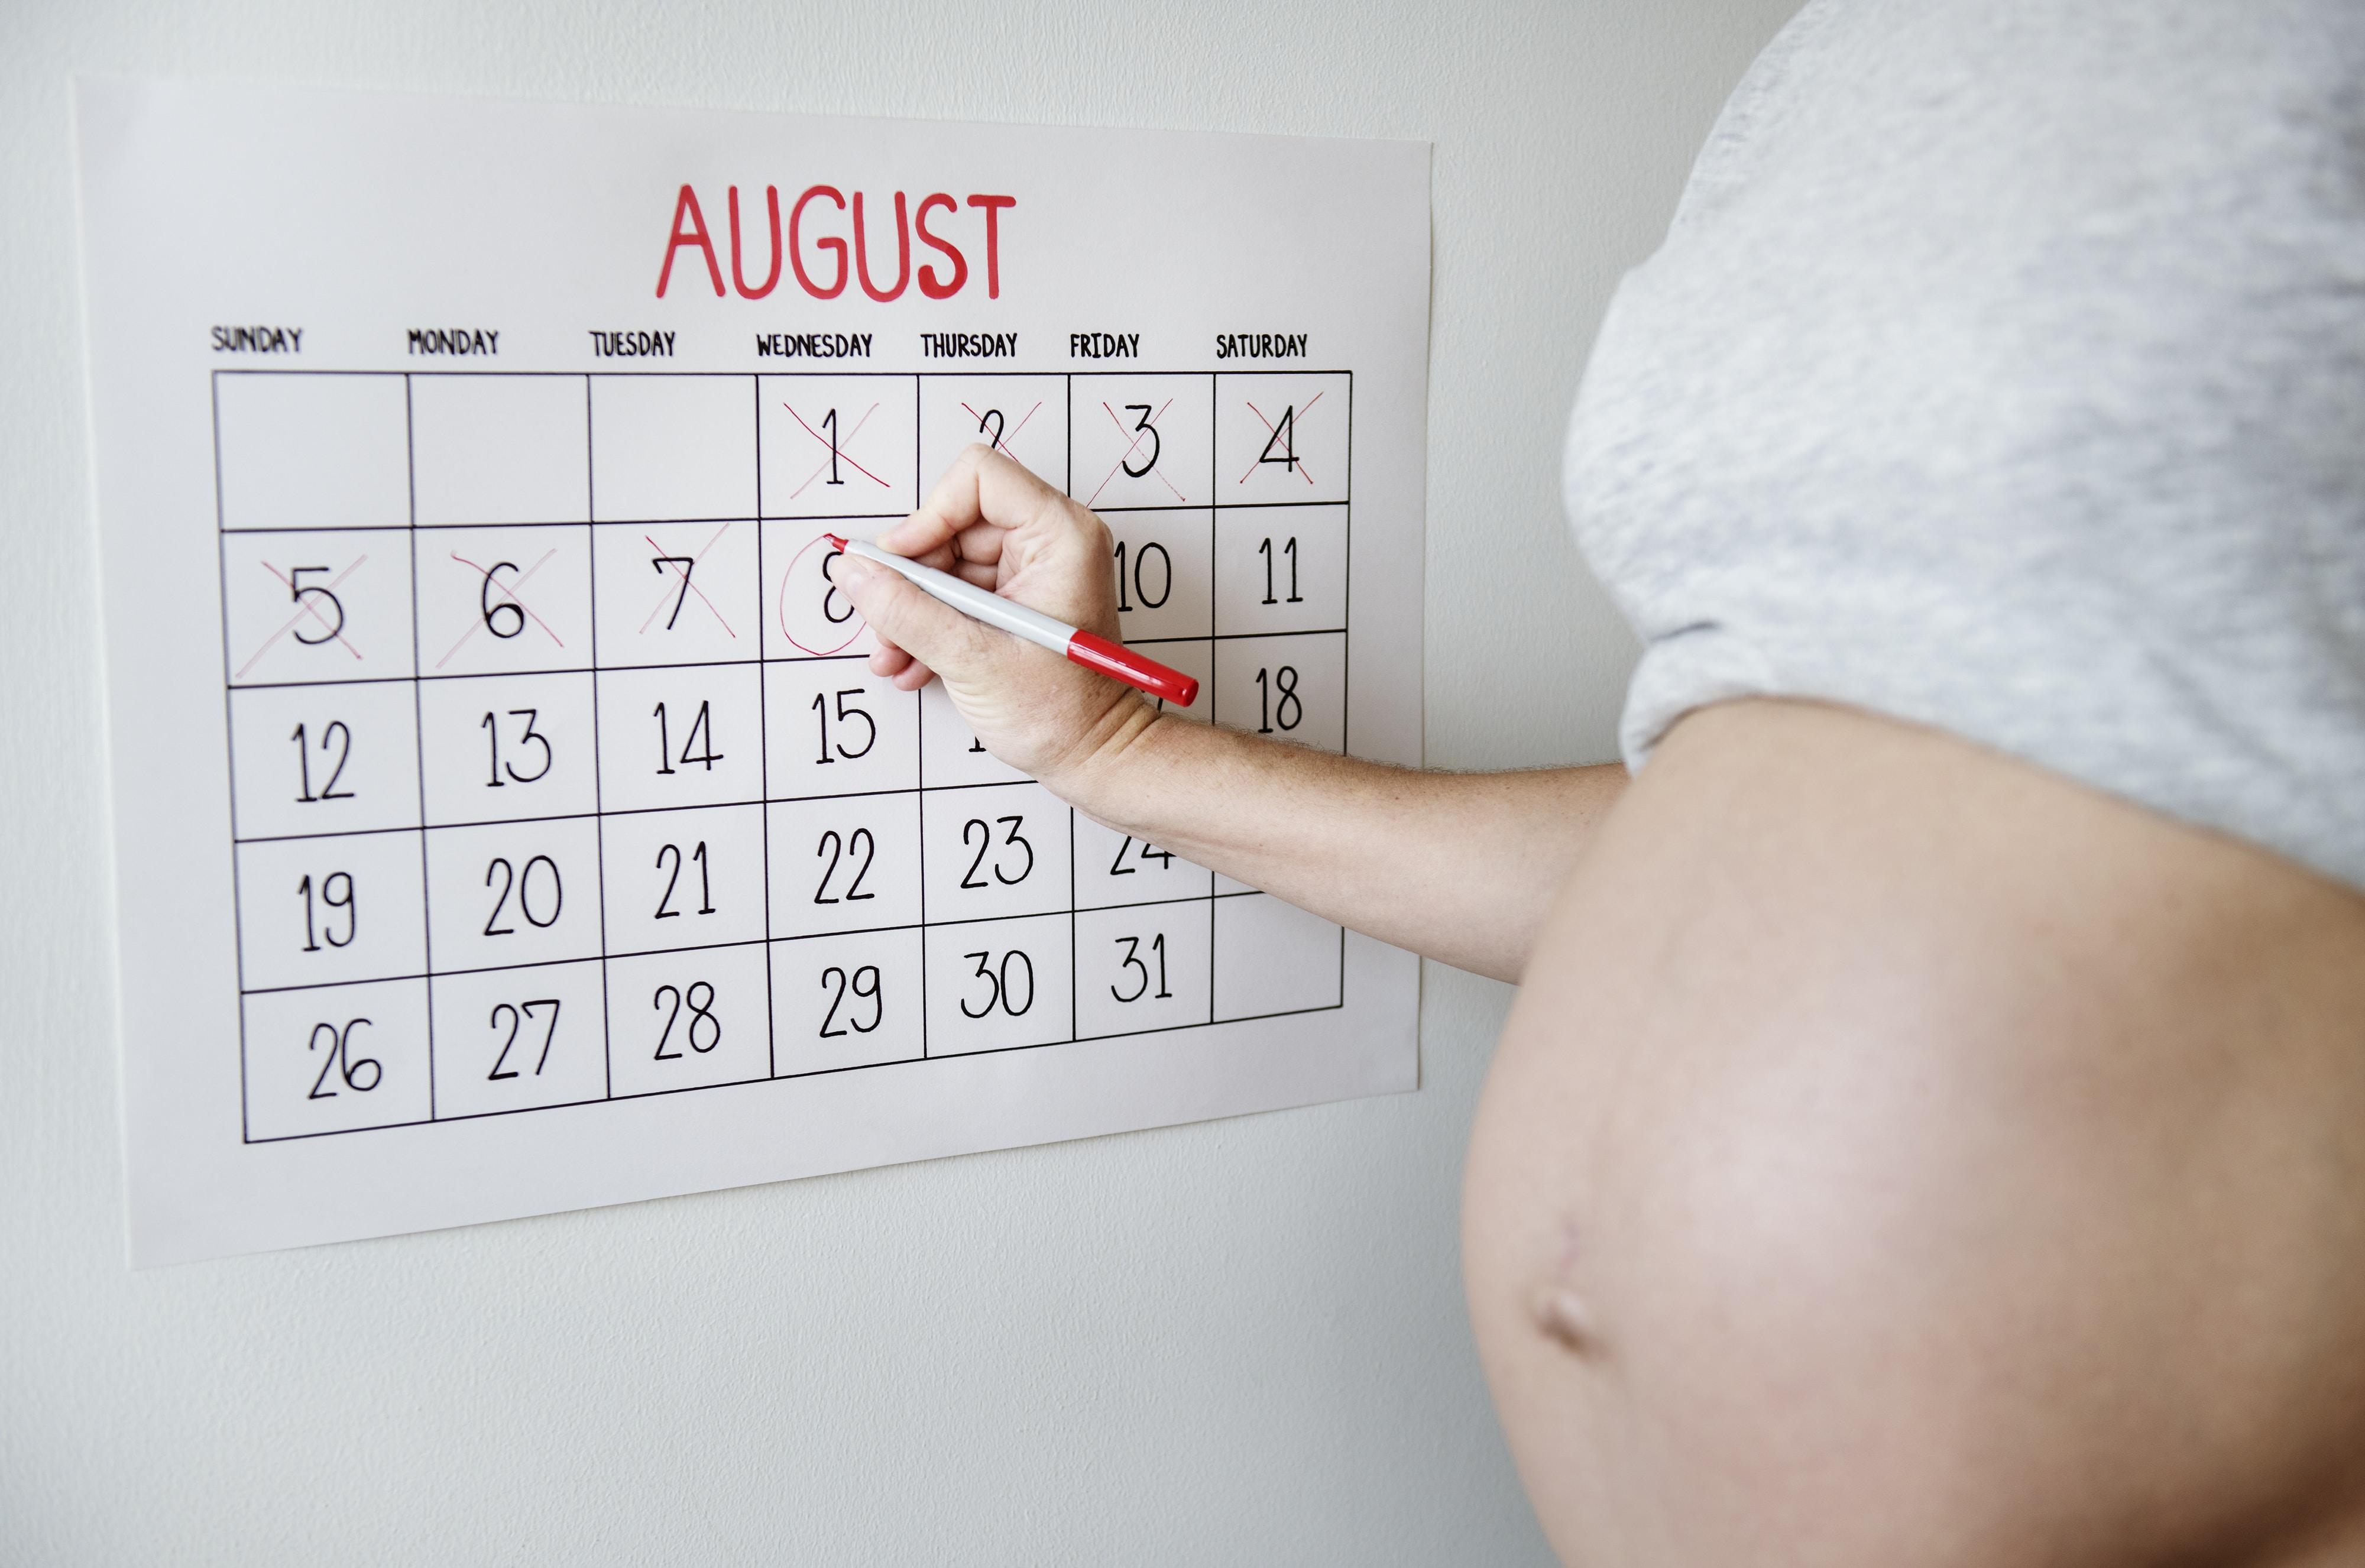 pregnant woman marking August 8 calendar